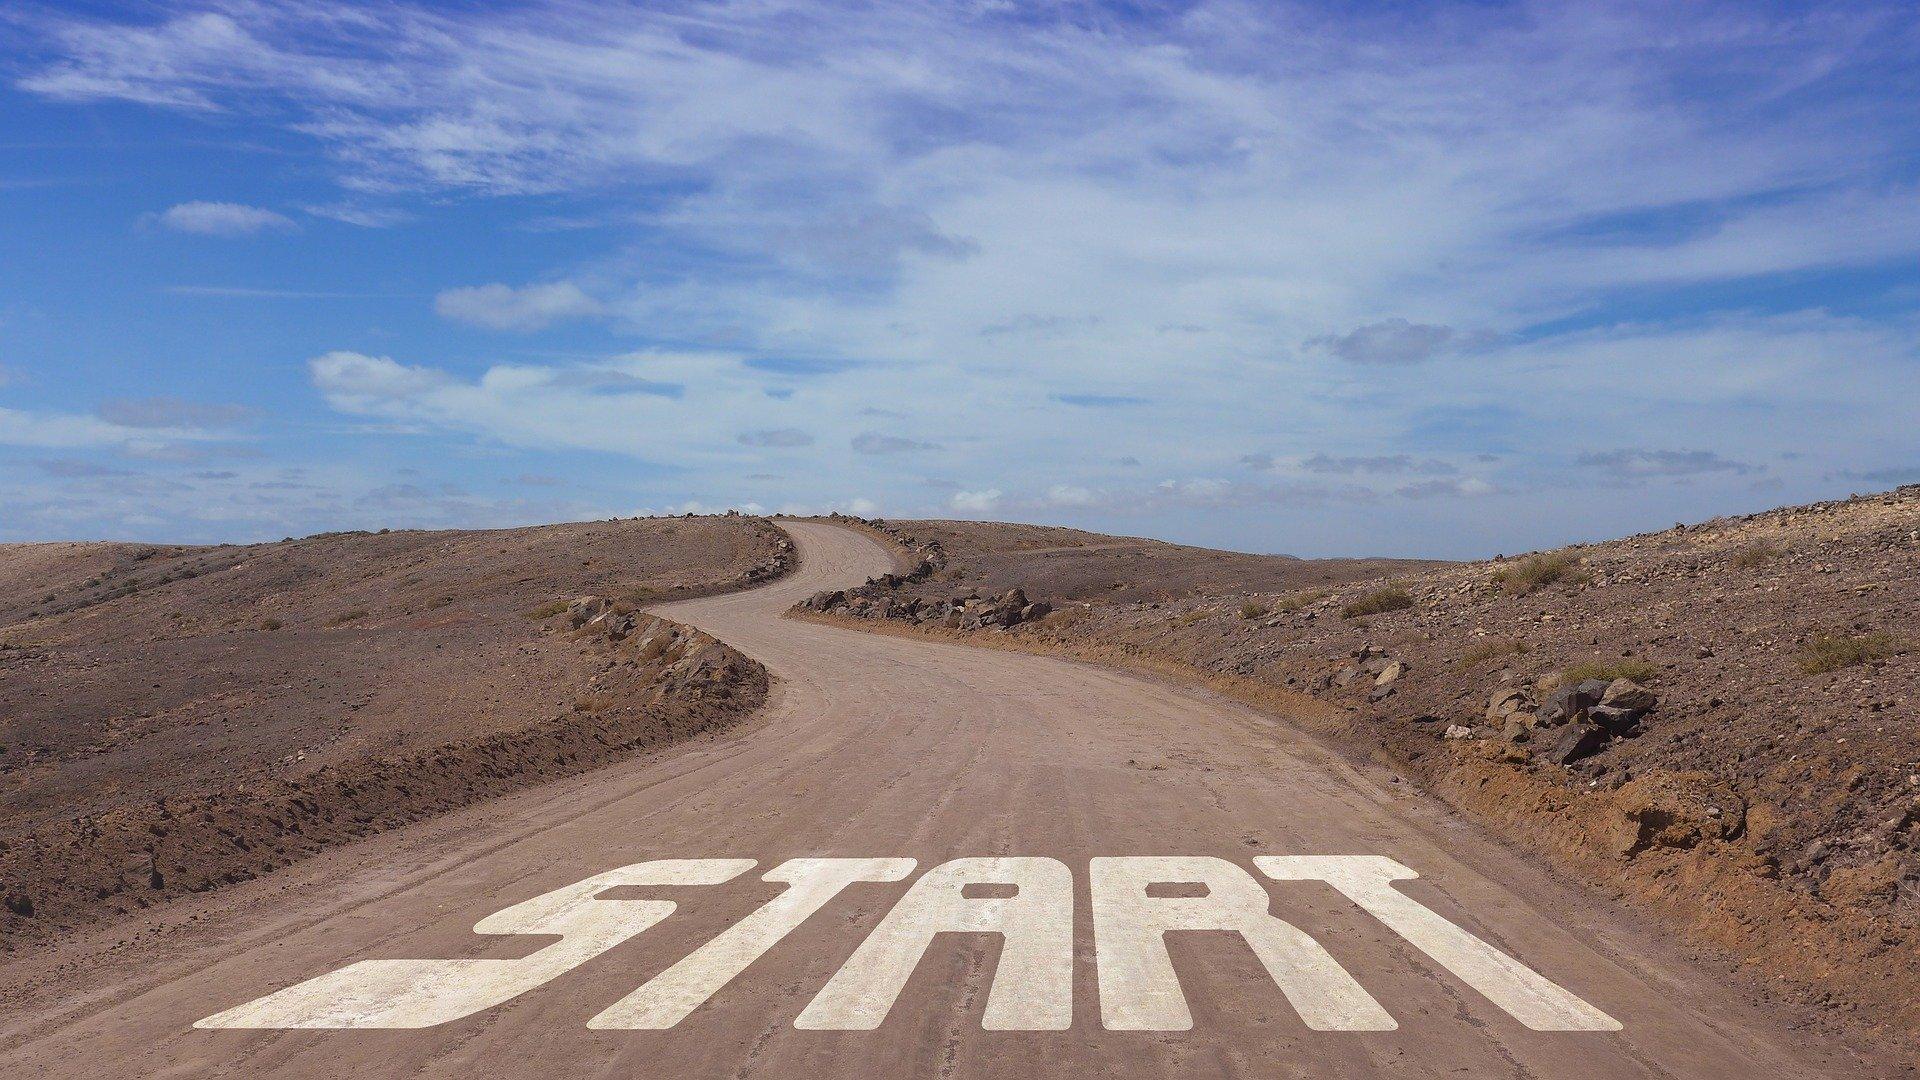 Beginning start line road